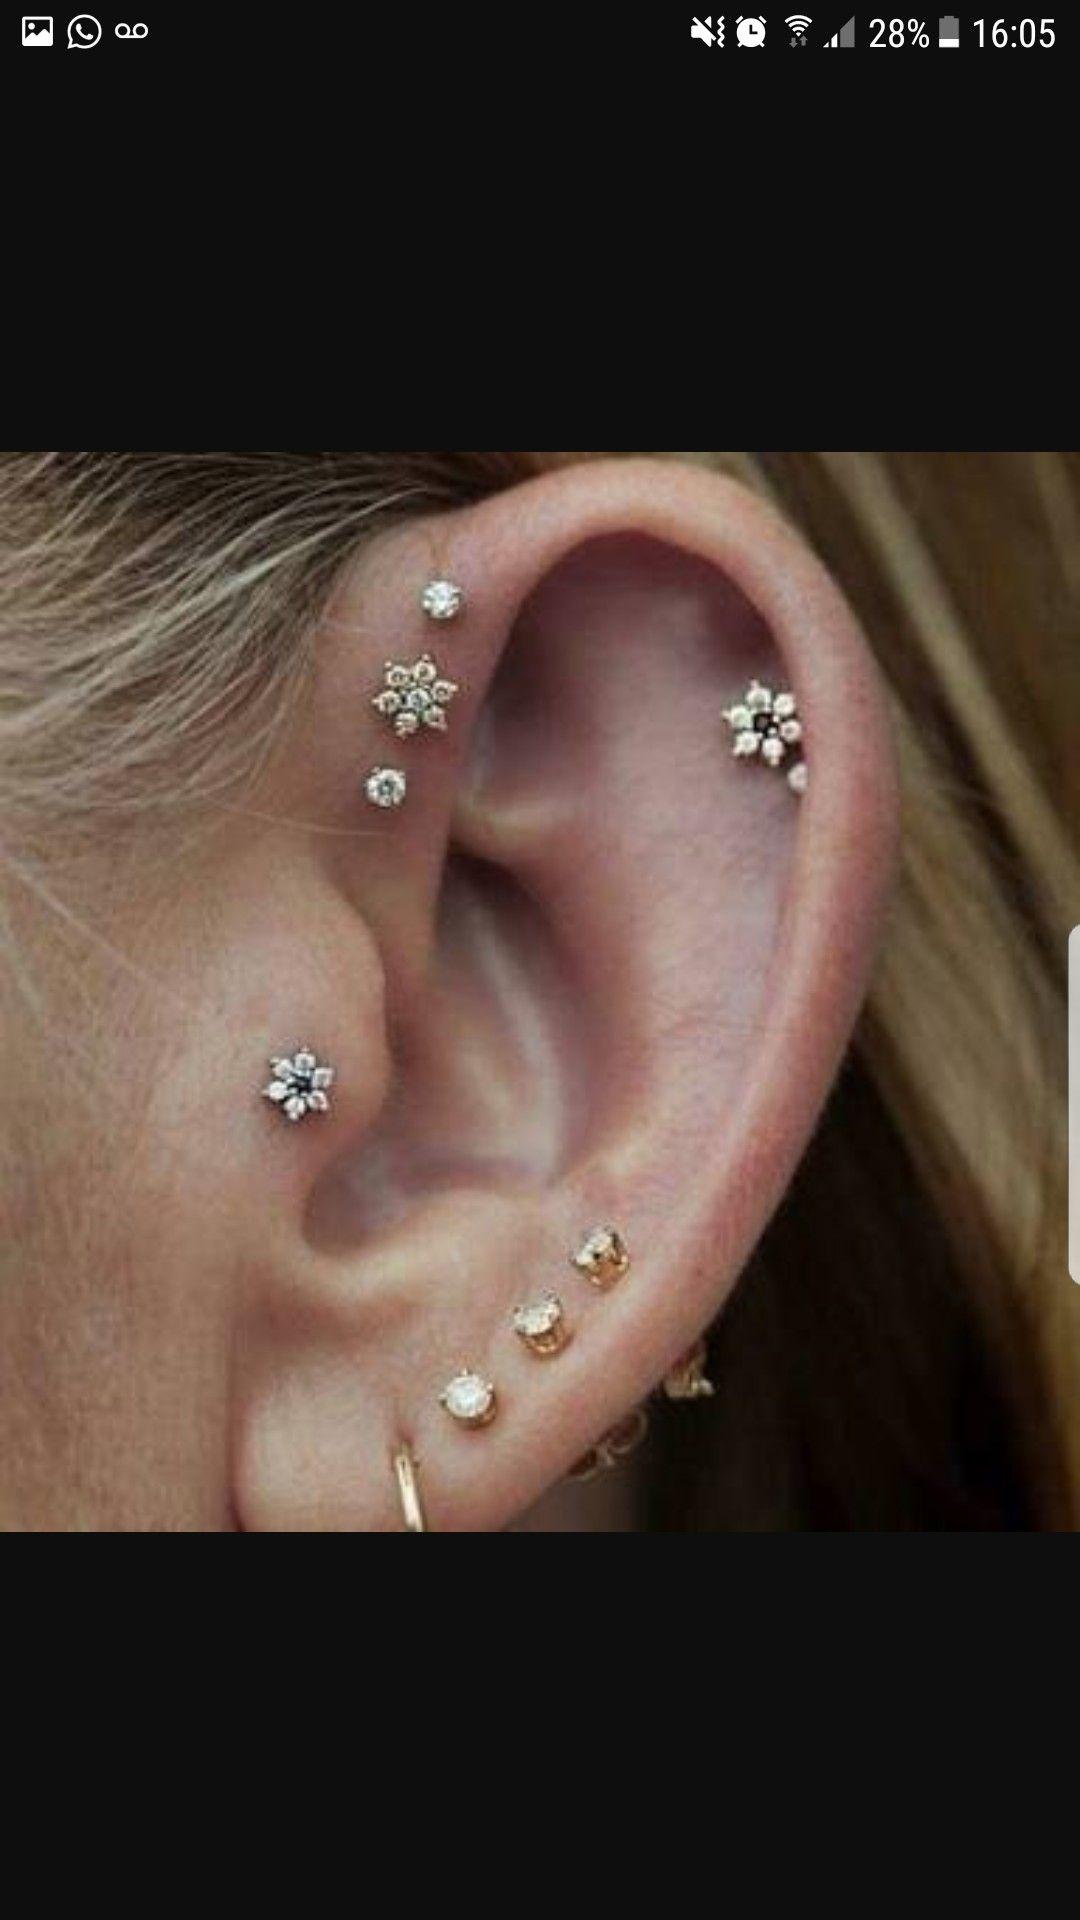 Healed up nose piercing  Pin by Paula Zanferrari on Pircingus  Pinterest